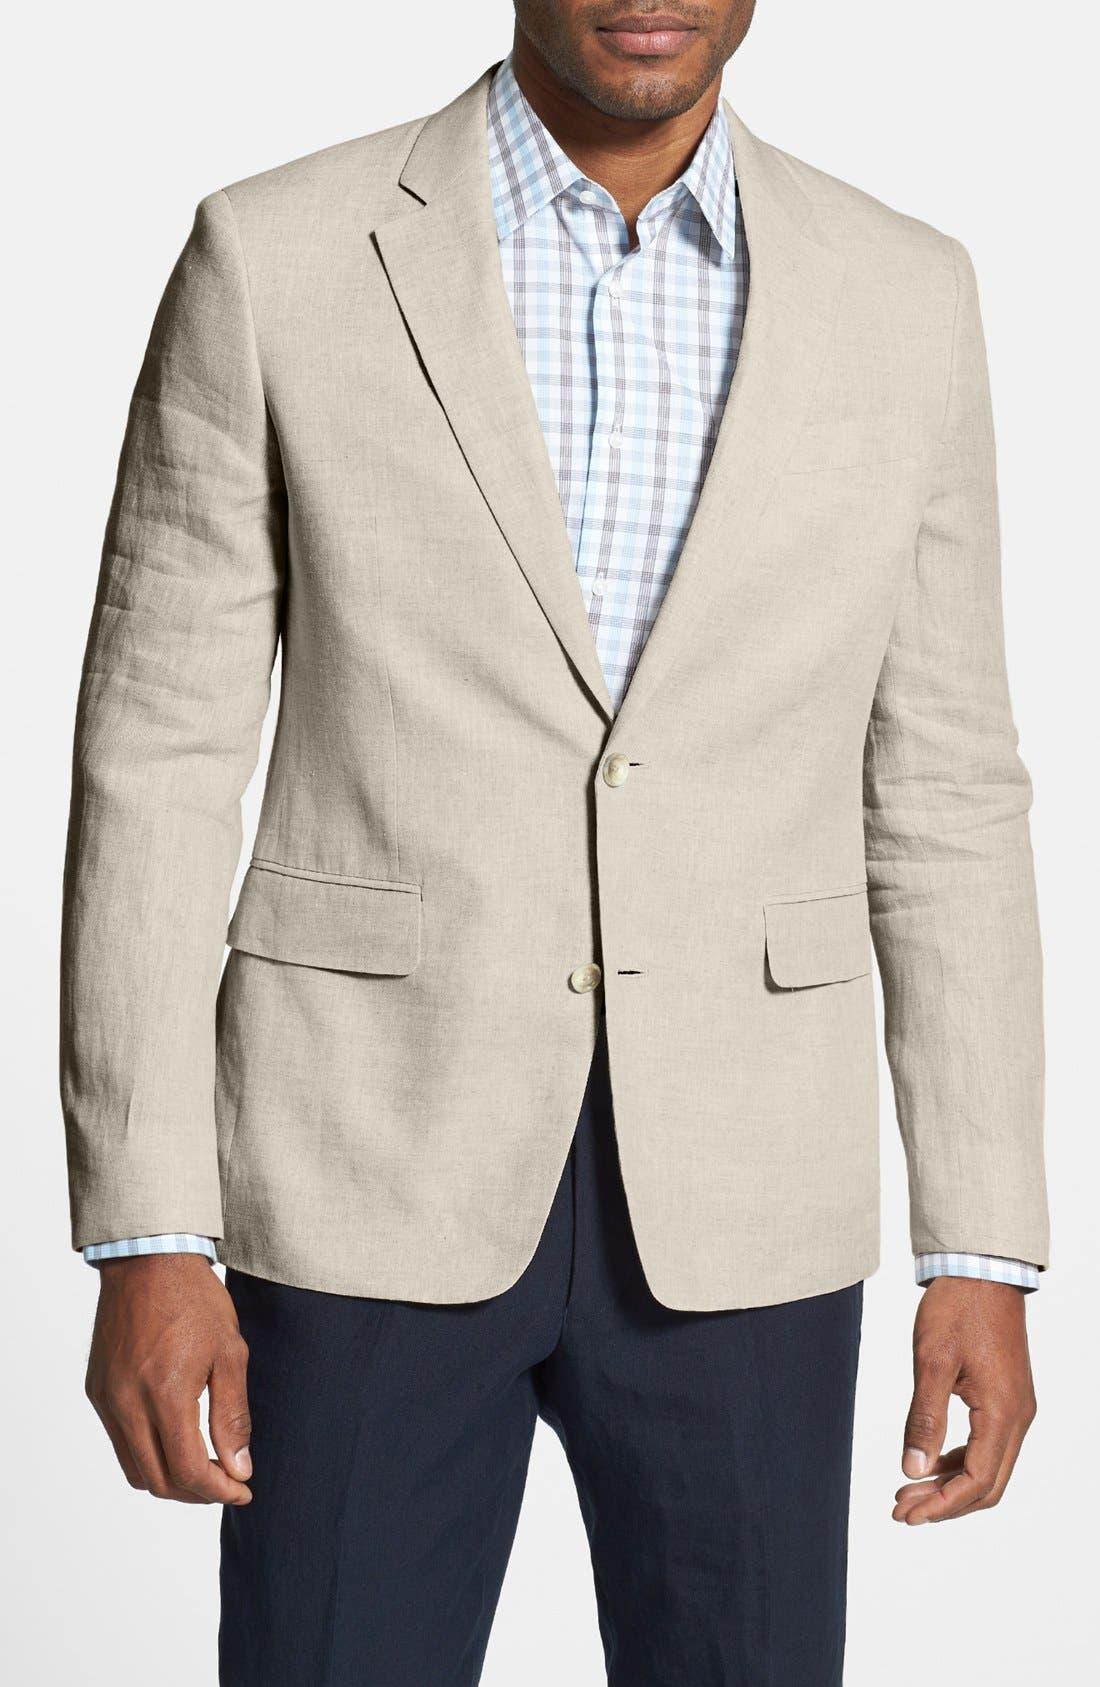 Main Image - Nordstrom Men's Shop Trim Fit Linen Blazer